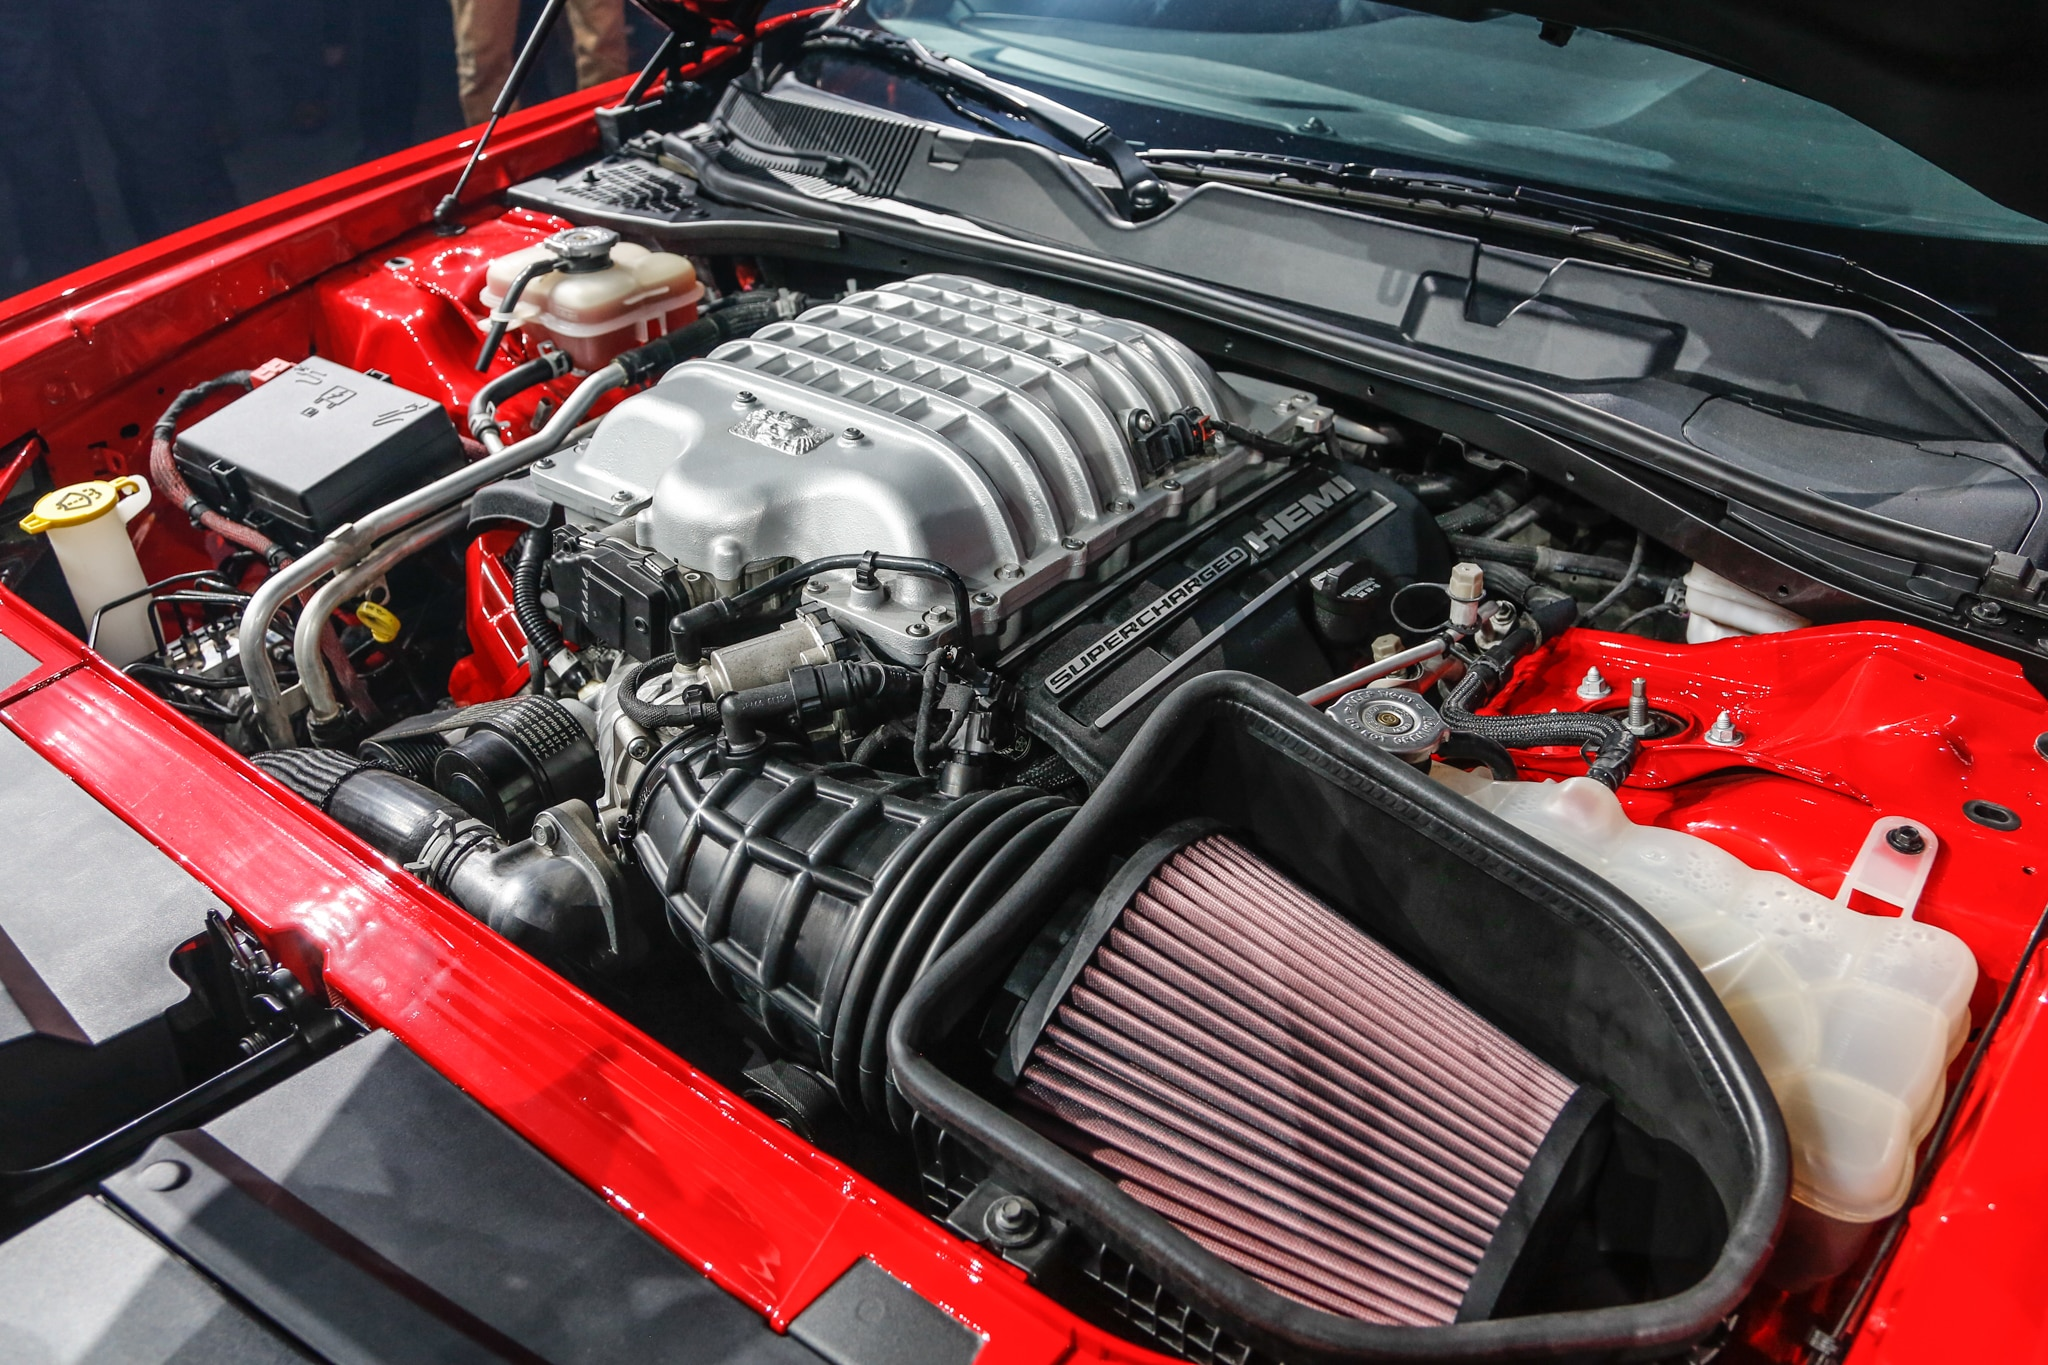 2018 Dodge Challenger Srt Demon Engine 02 1 Motor Trend